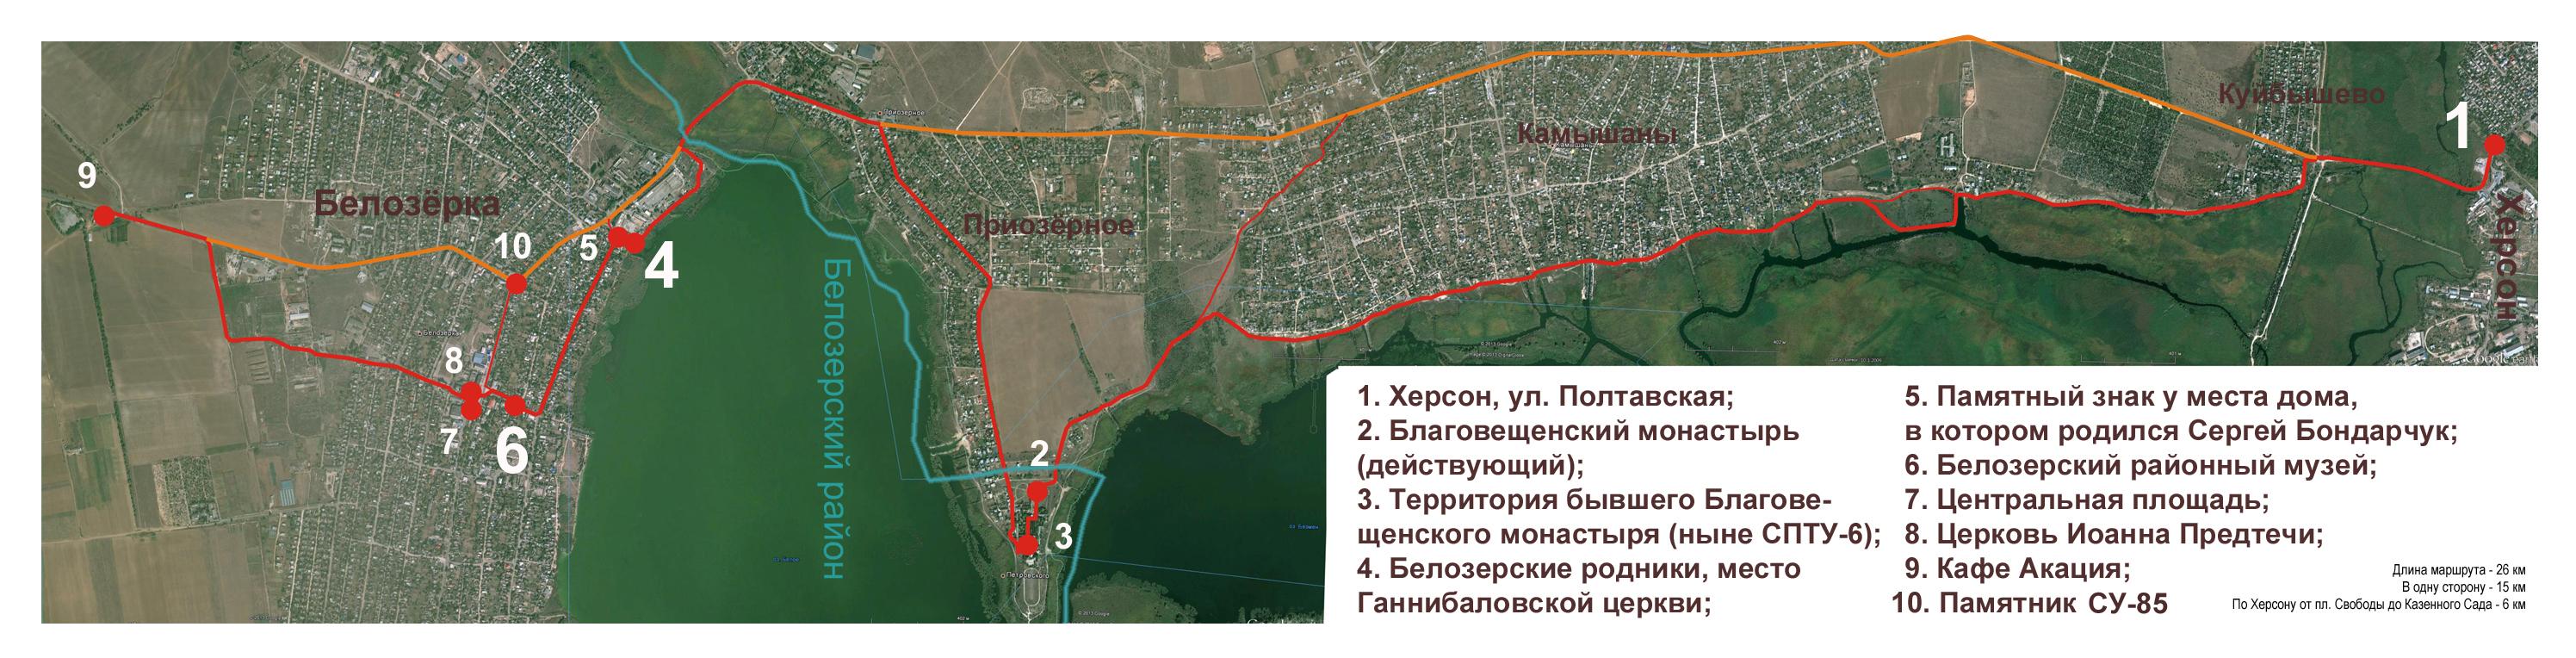 http://s5.uploads.ru/mdnFO.jpg